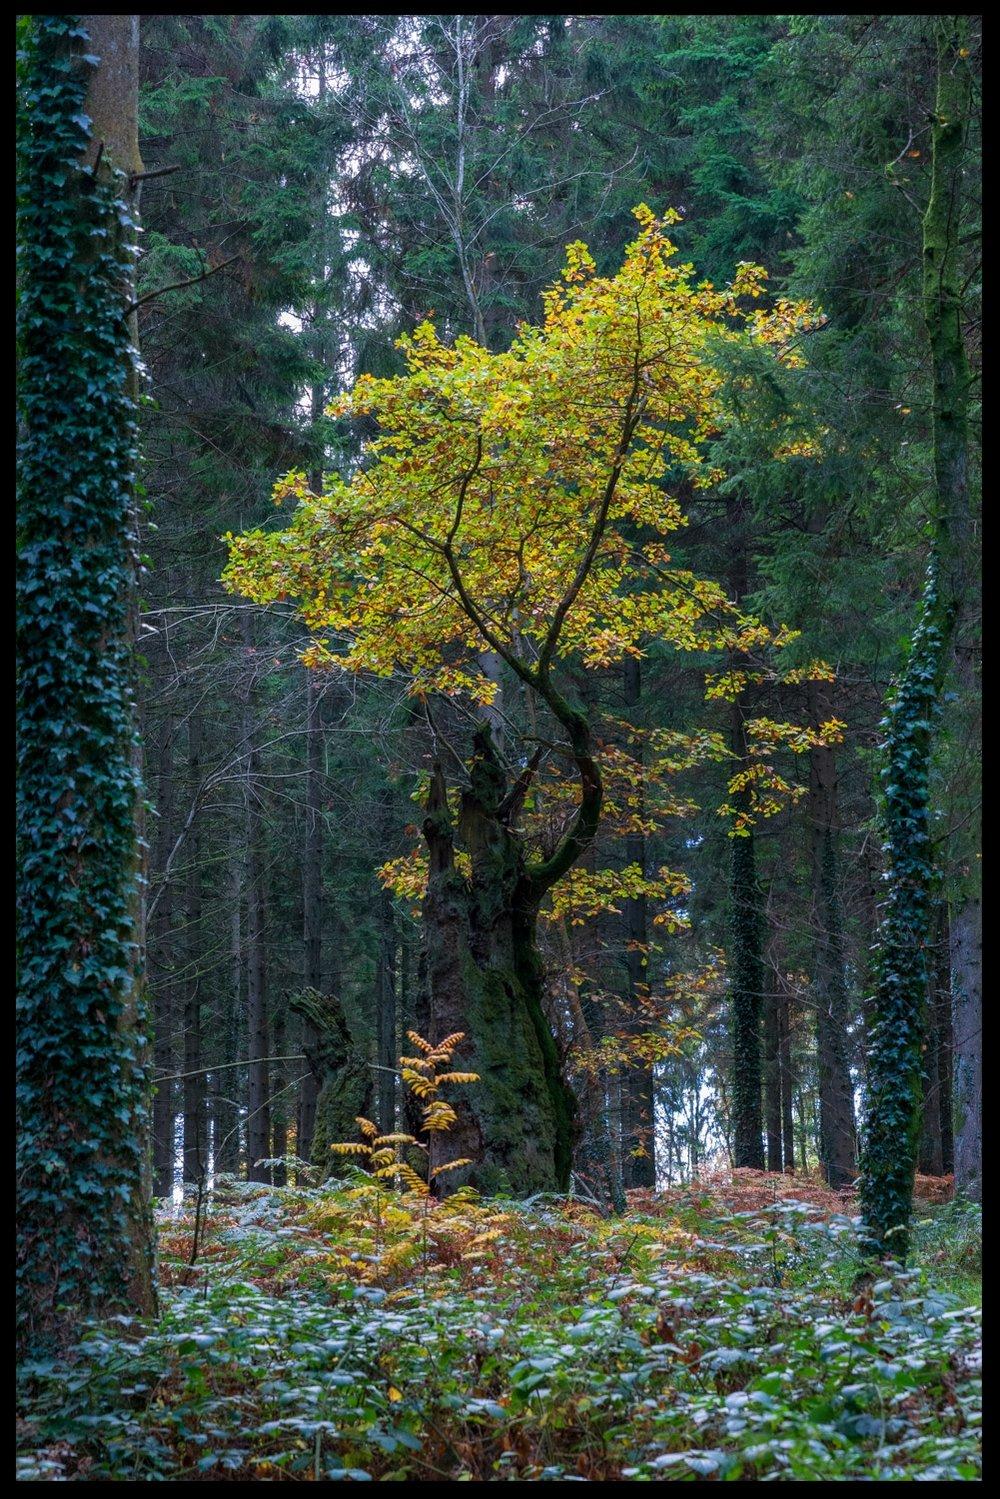 Zytynski-Autumn-Woodlands-16.jpg